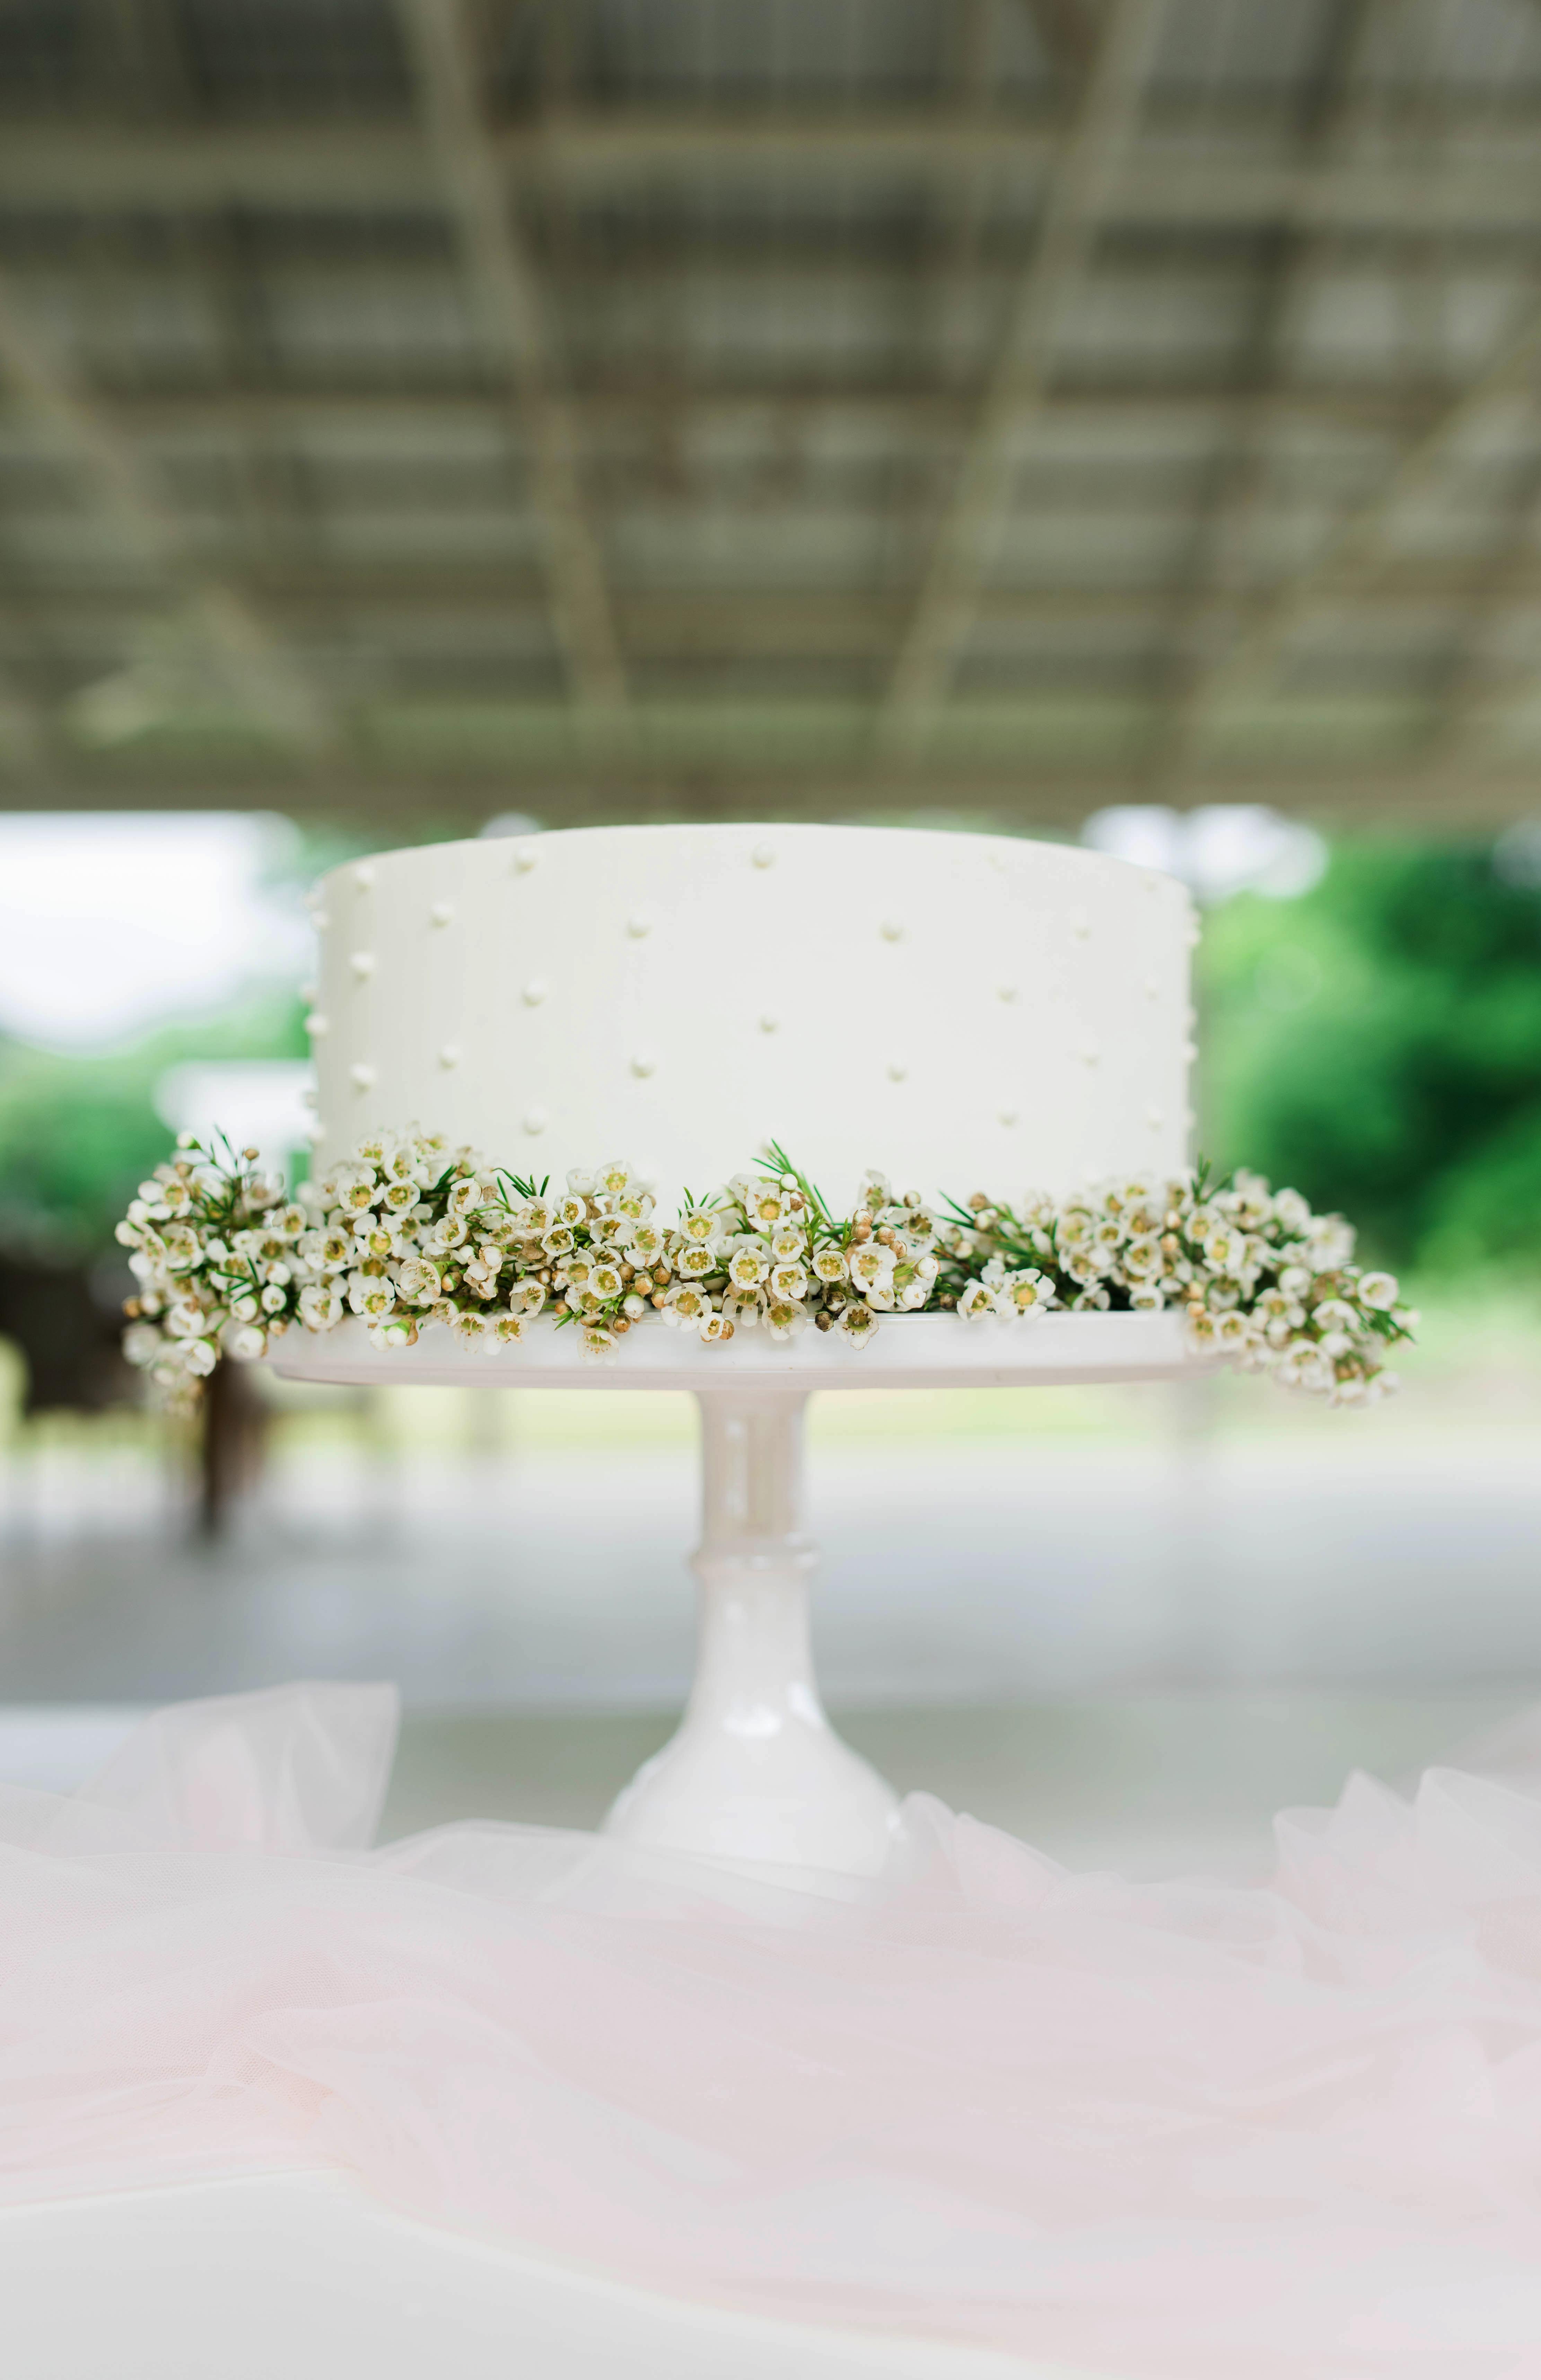 floral wedding cakes kaley elaine outdoors simple white greenery